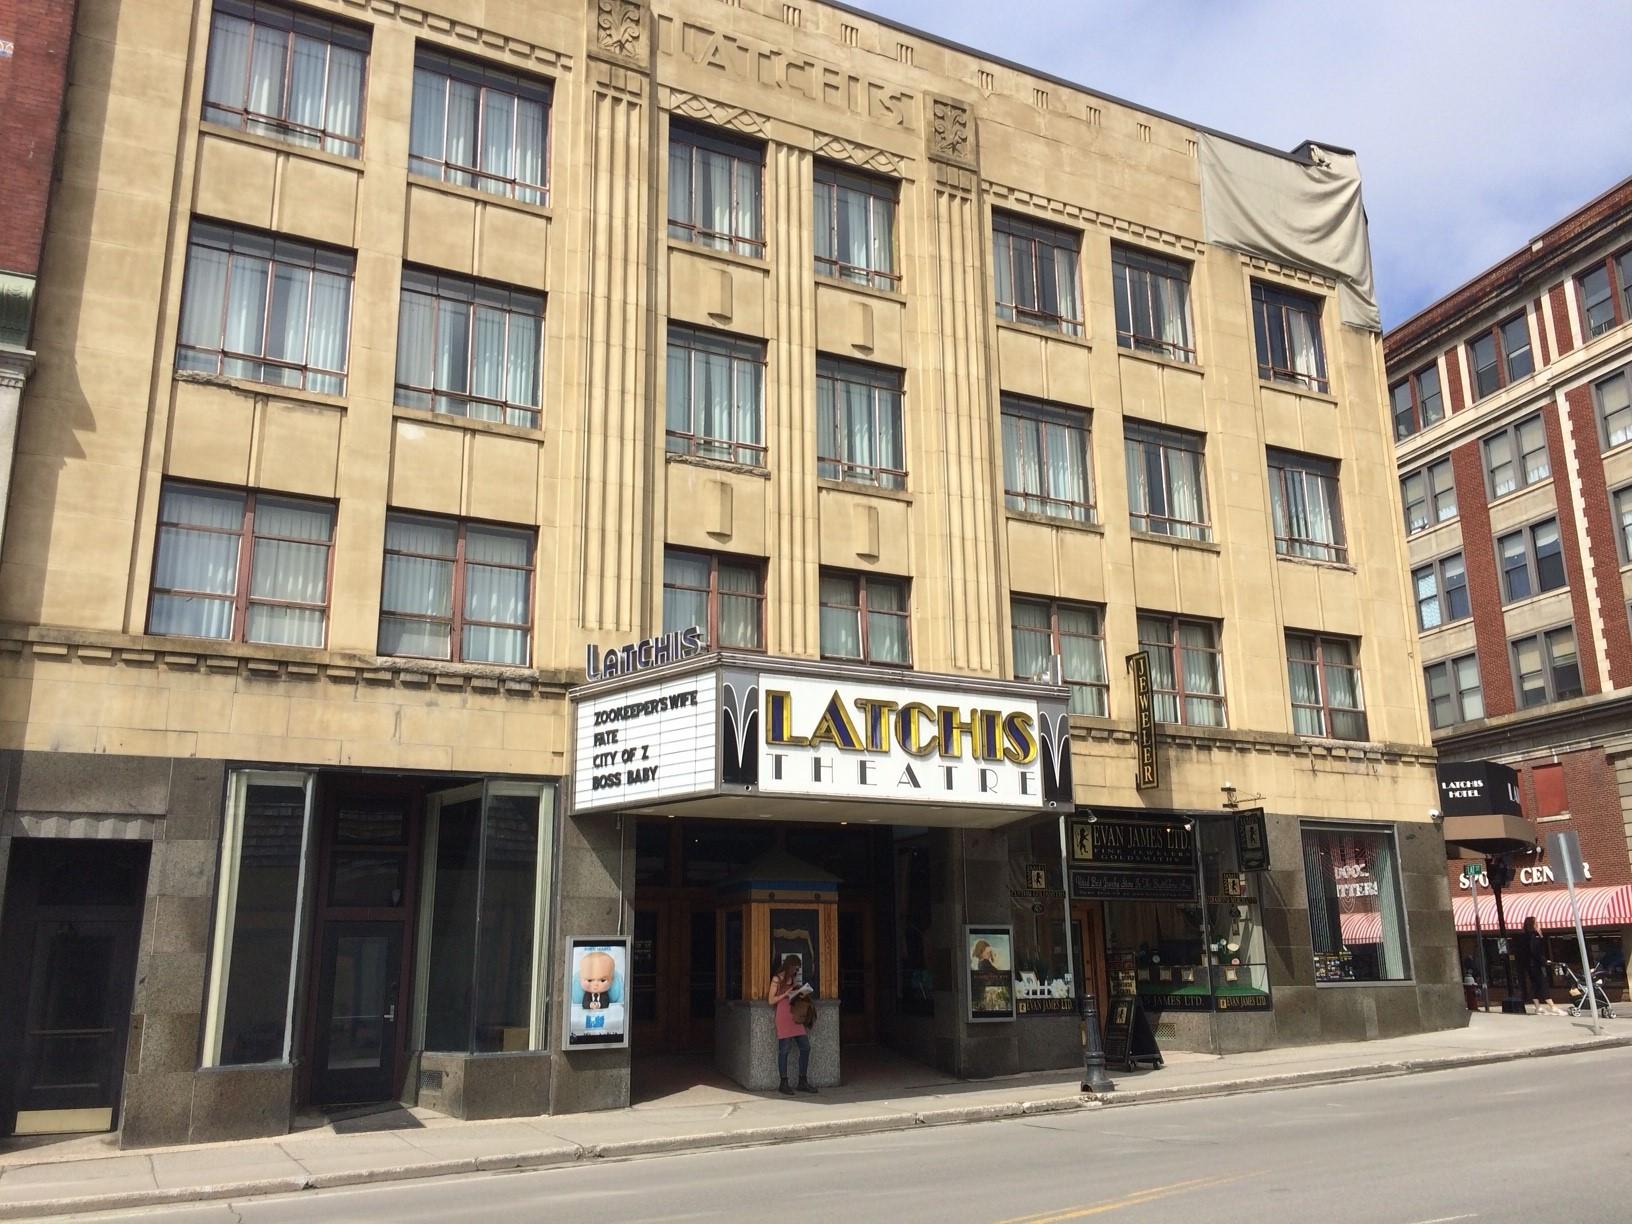 The Latchis Hotel & Theatre in Brattleboro.